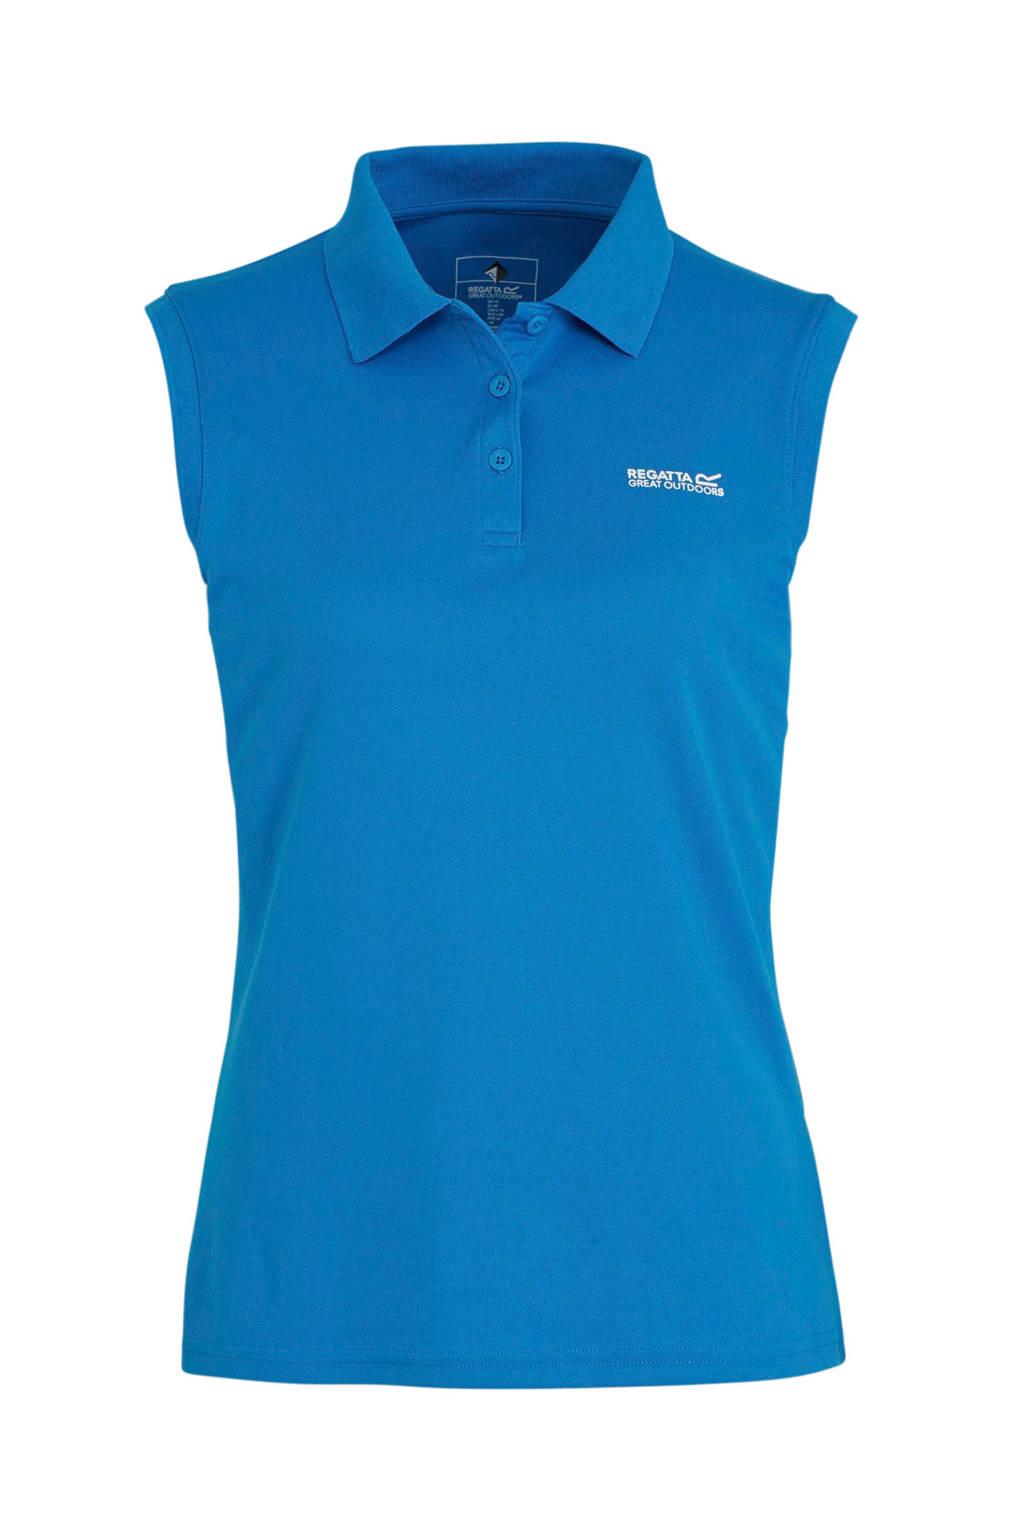 Regatta outdoor polo blauw, Blauw